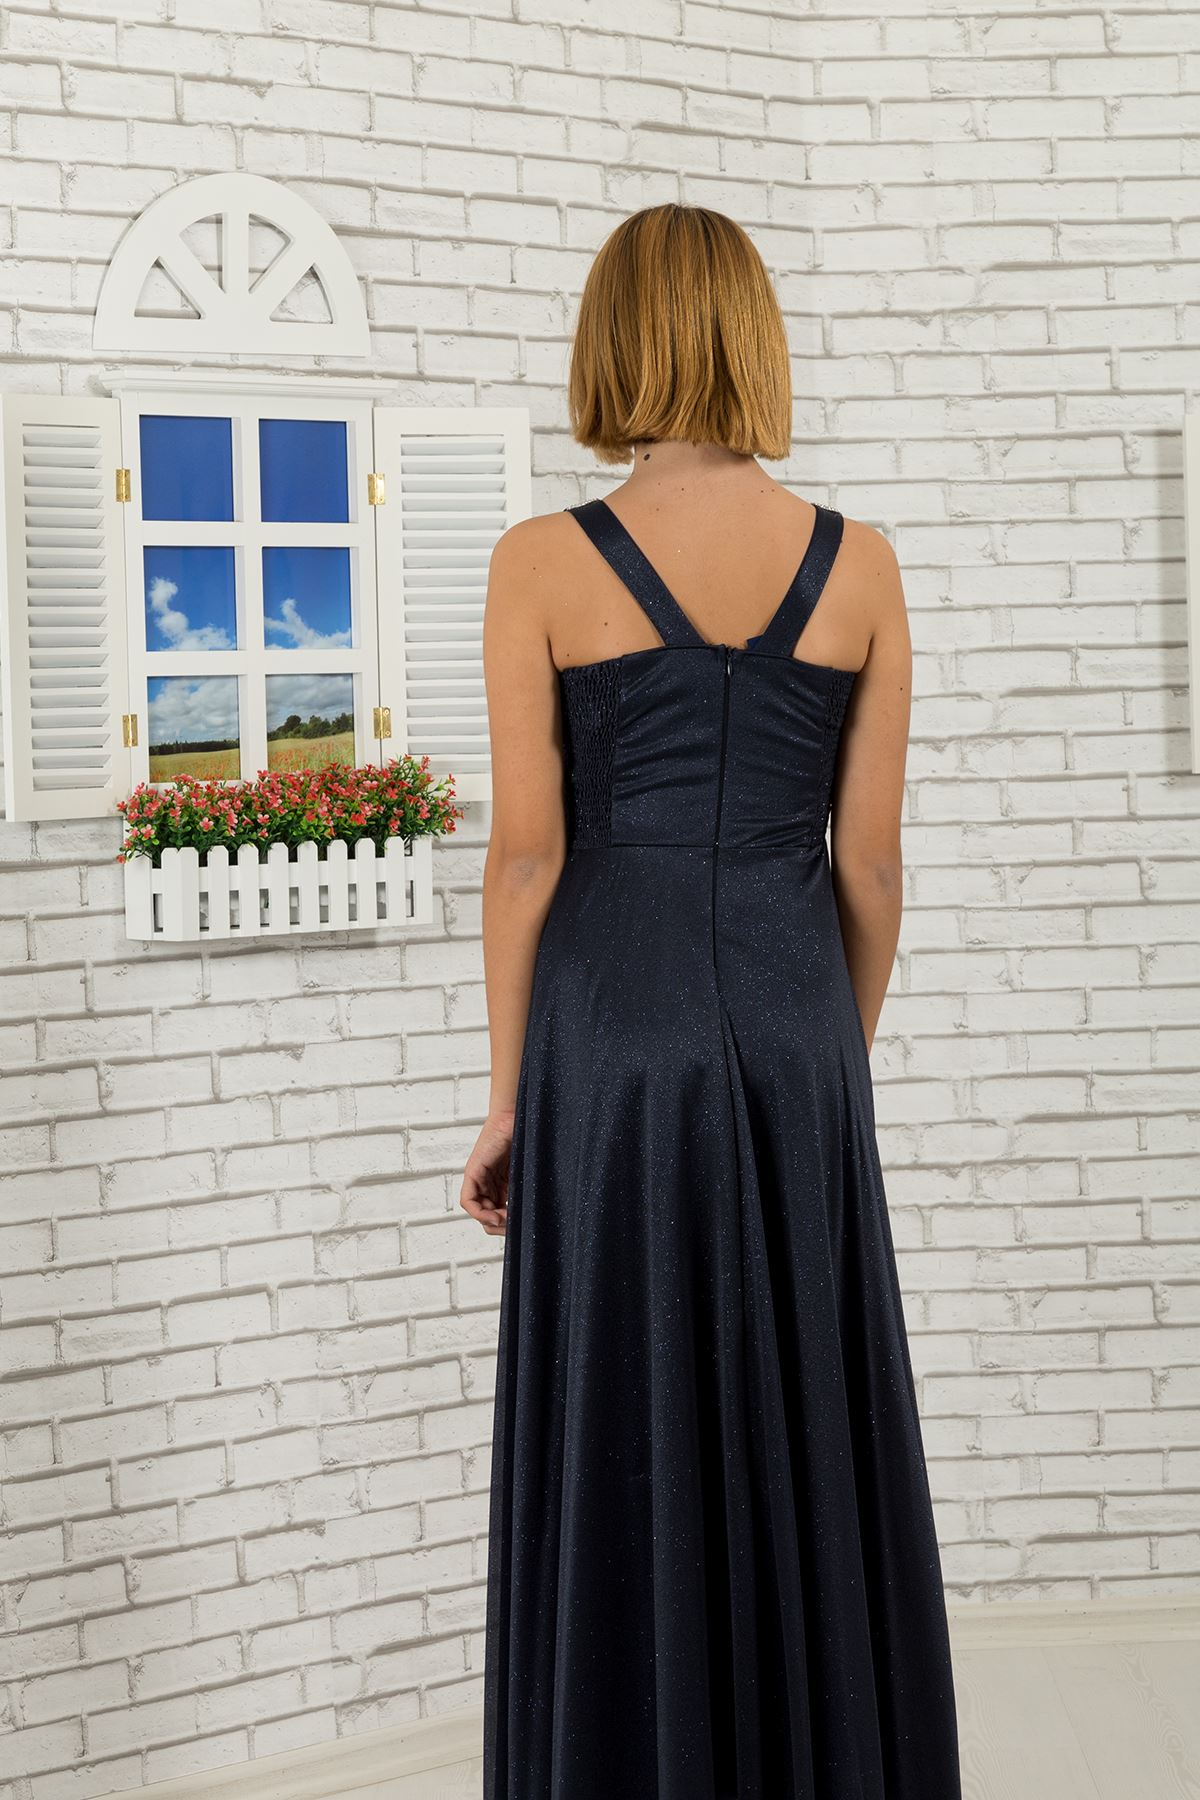 Waist stone, collar detail, silvery chiffon Girl Boy evening dress 473 Navy Blue